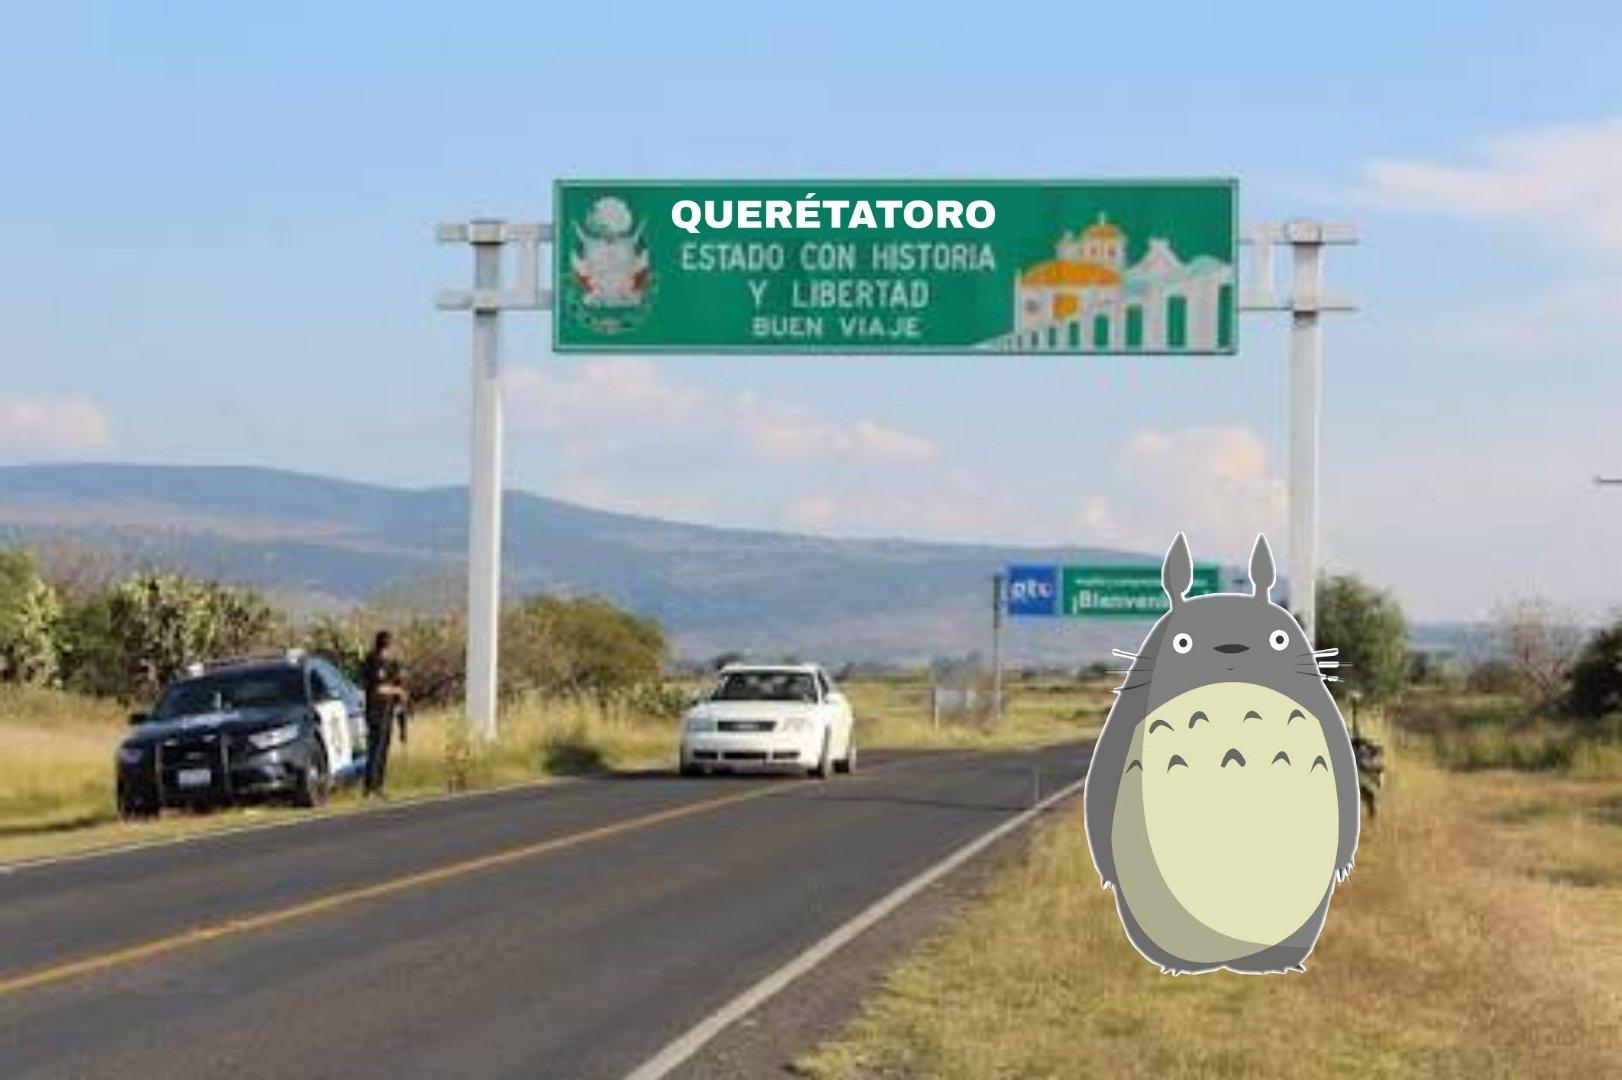 Memes de Queretatoro en la conferencia de Coronavirus